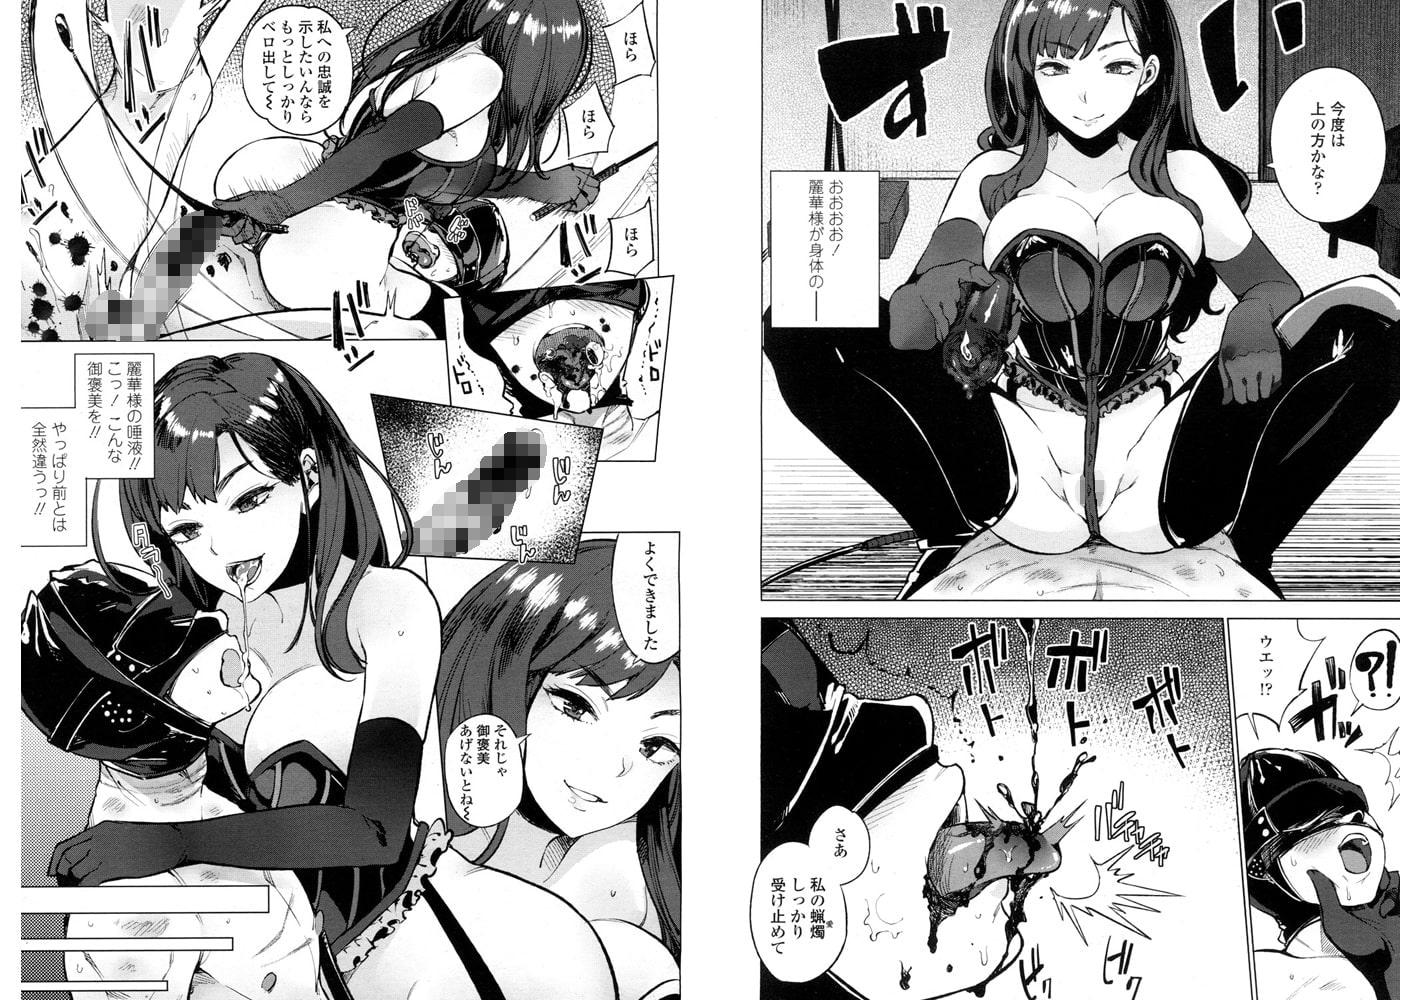 Girls forM 全巻パックのサンプル画像